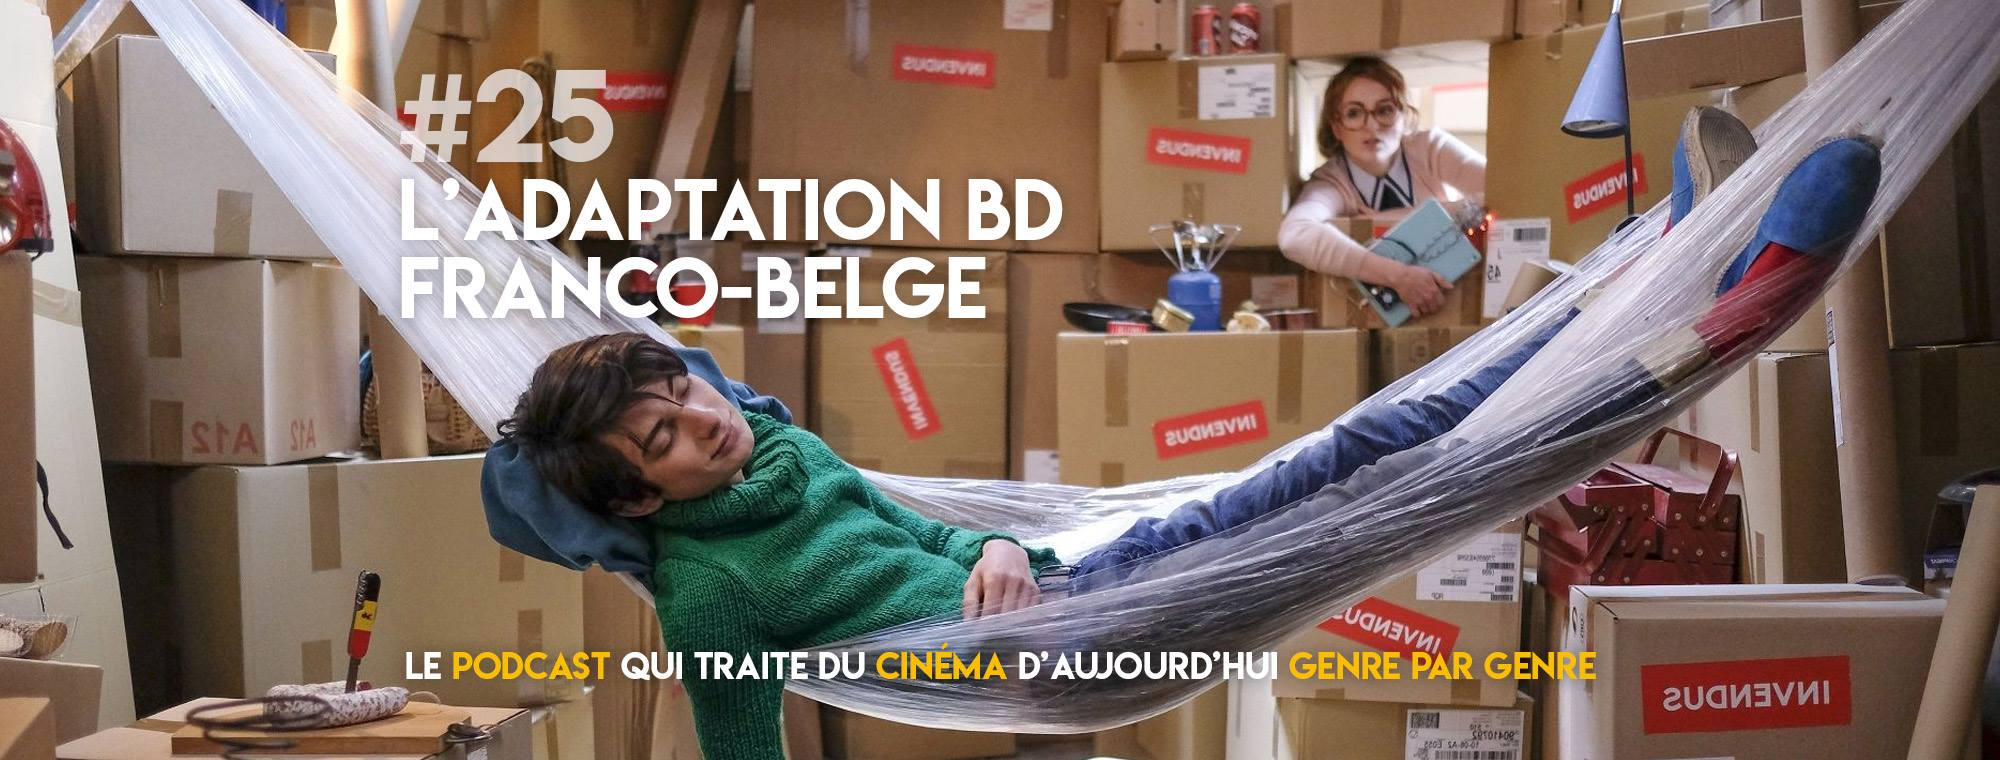 Parlons Péloches - #25 L'adaptation BD franco-belge